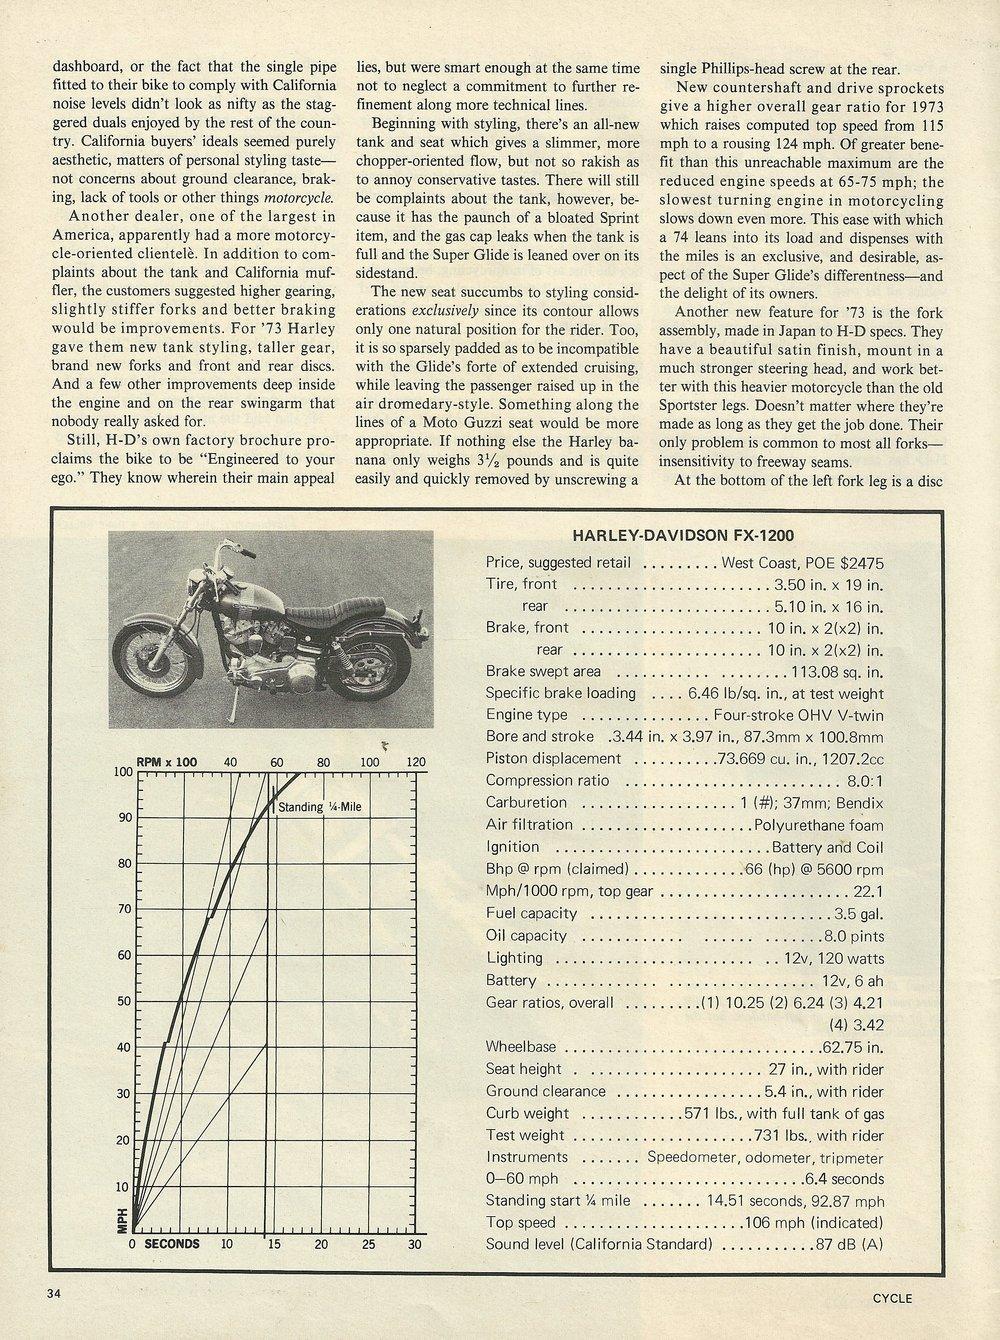 1973 Harley FX1200 road test 4.JPG